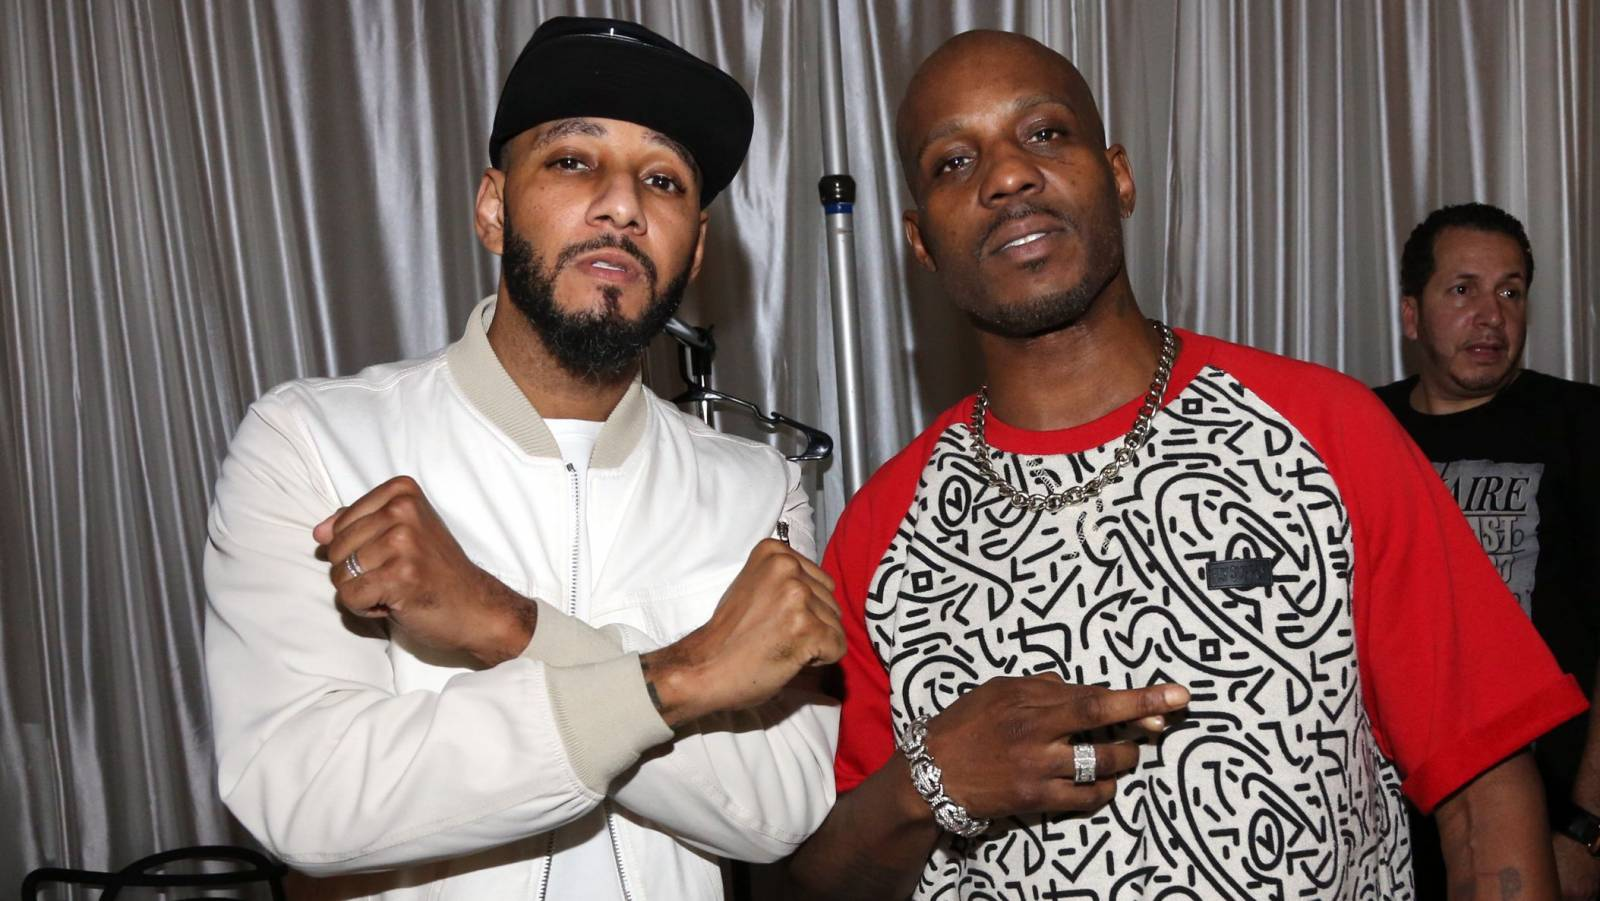 Method Man, Busta Rhymes, Eve, Swizz Beatz, Public Enemy, The Kid LAROI & More Mourn DMX's Death